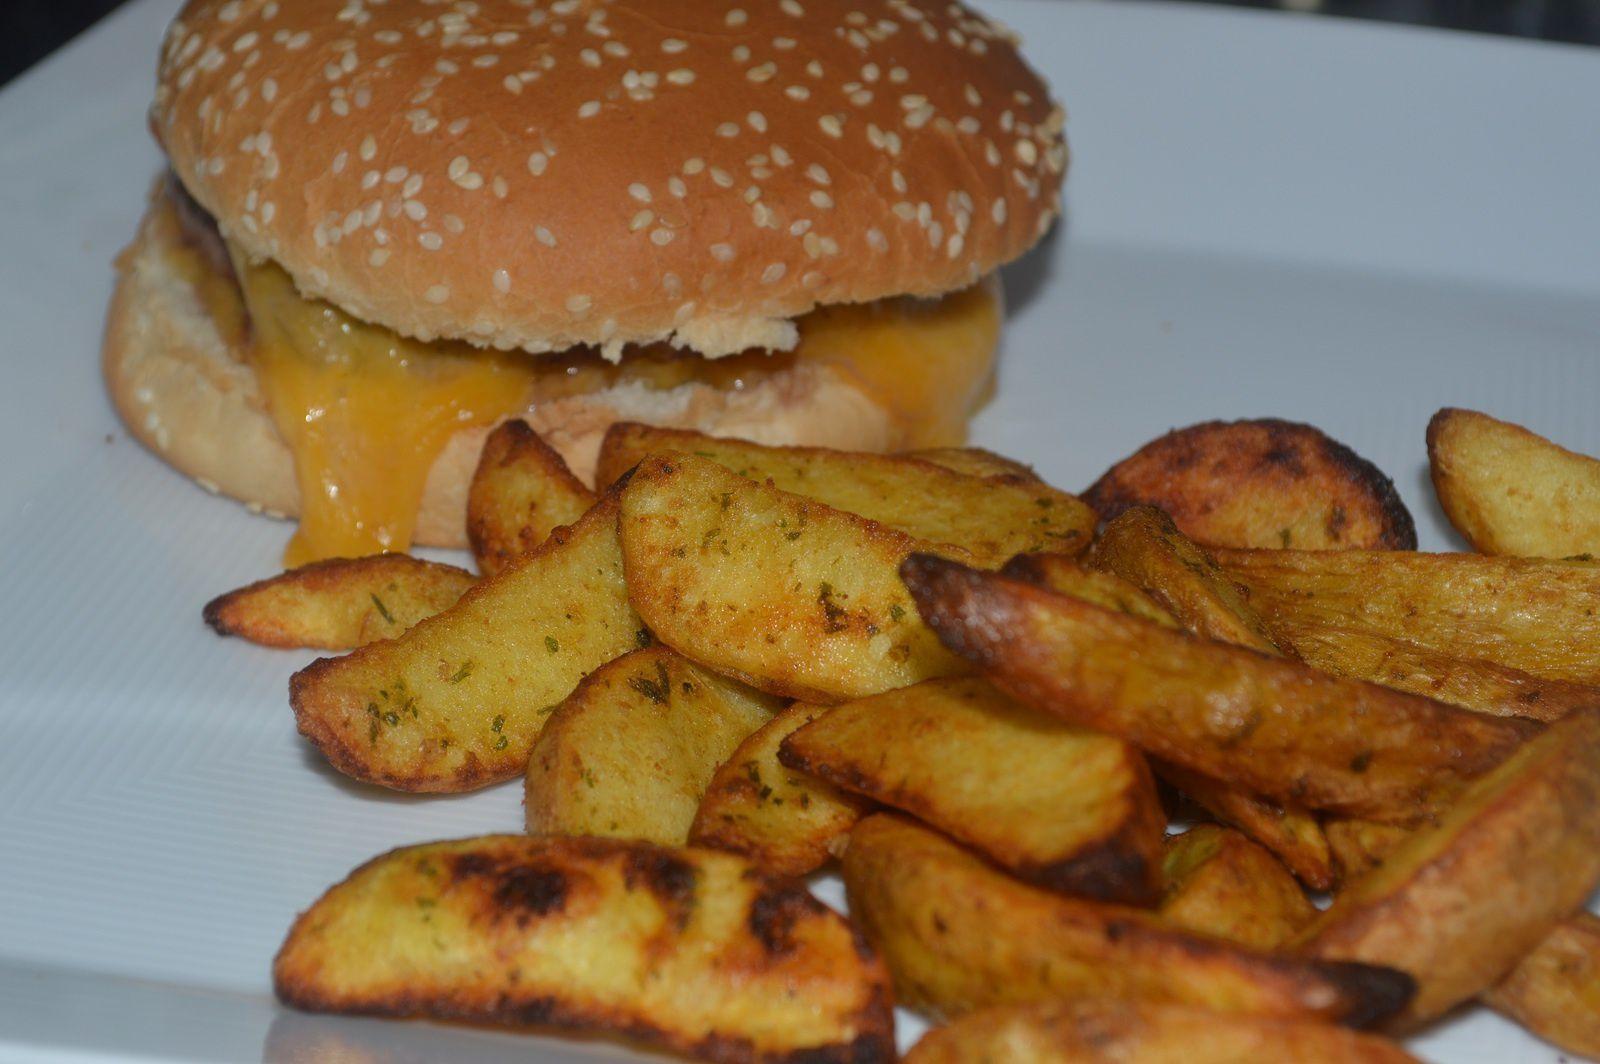 Hamburger - potatoes